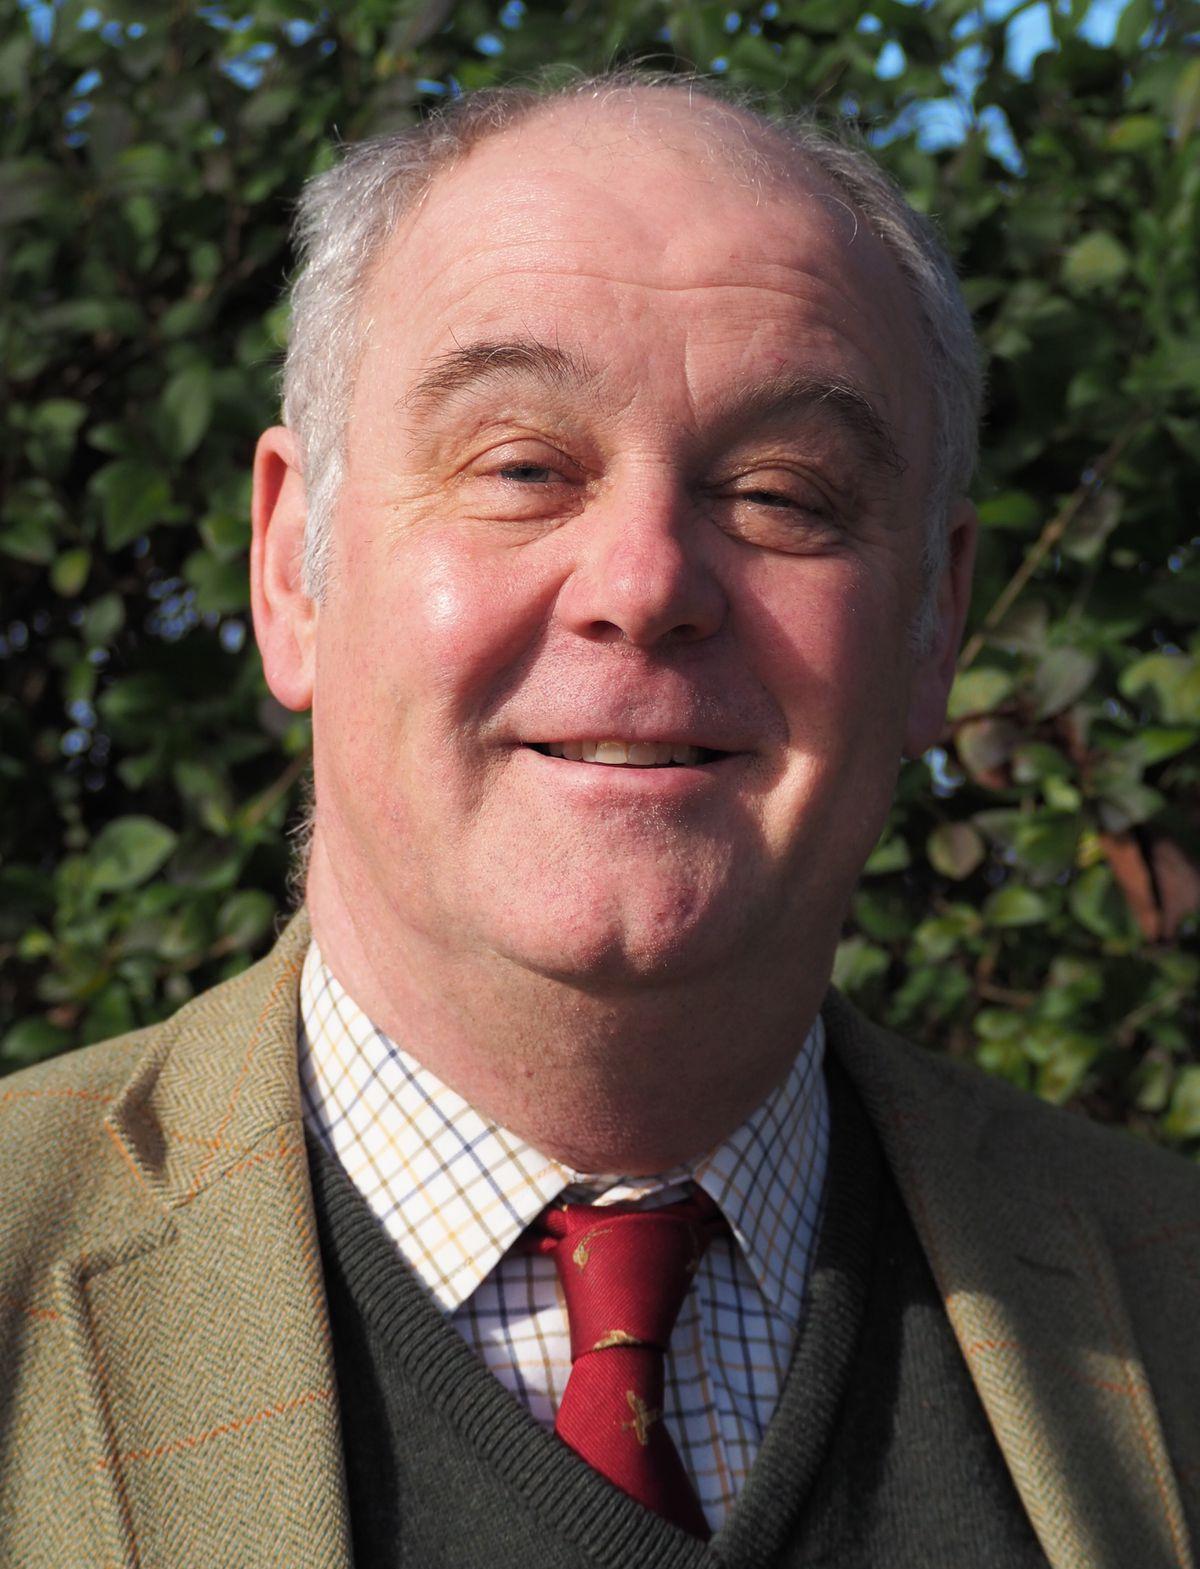 David Roberts, of G O Davies (Westbury) Ltd grain merchants